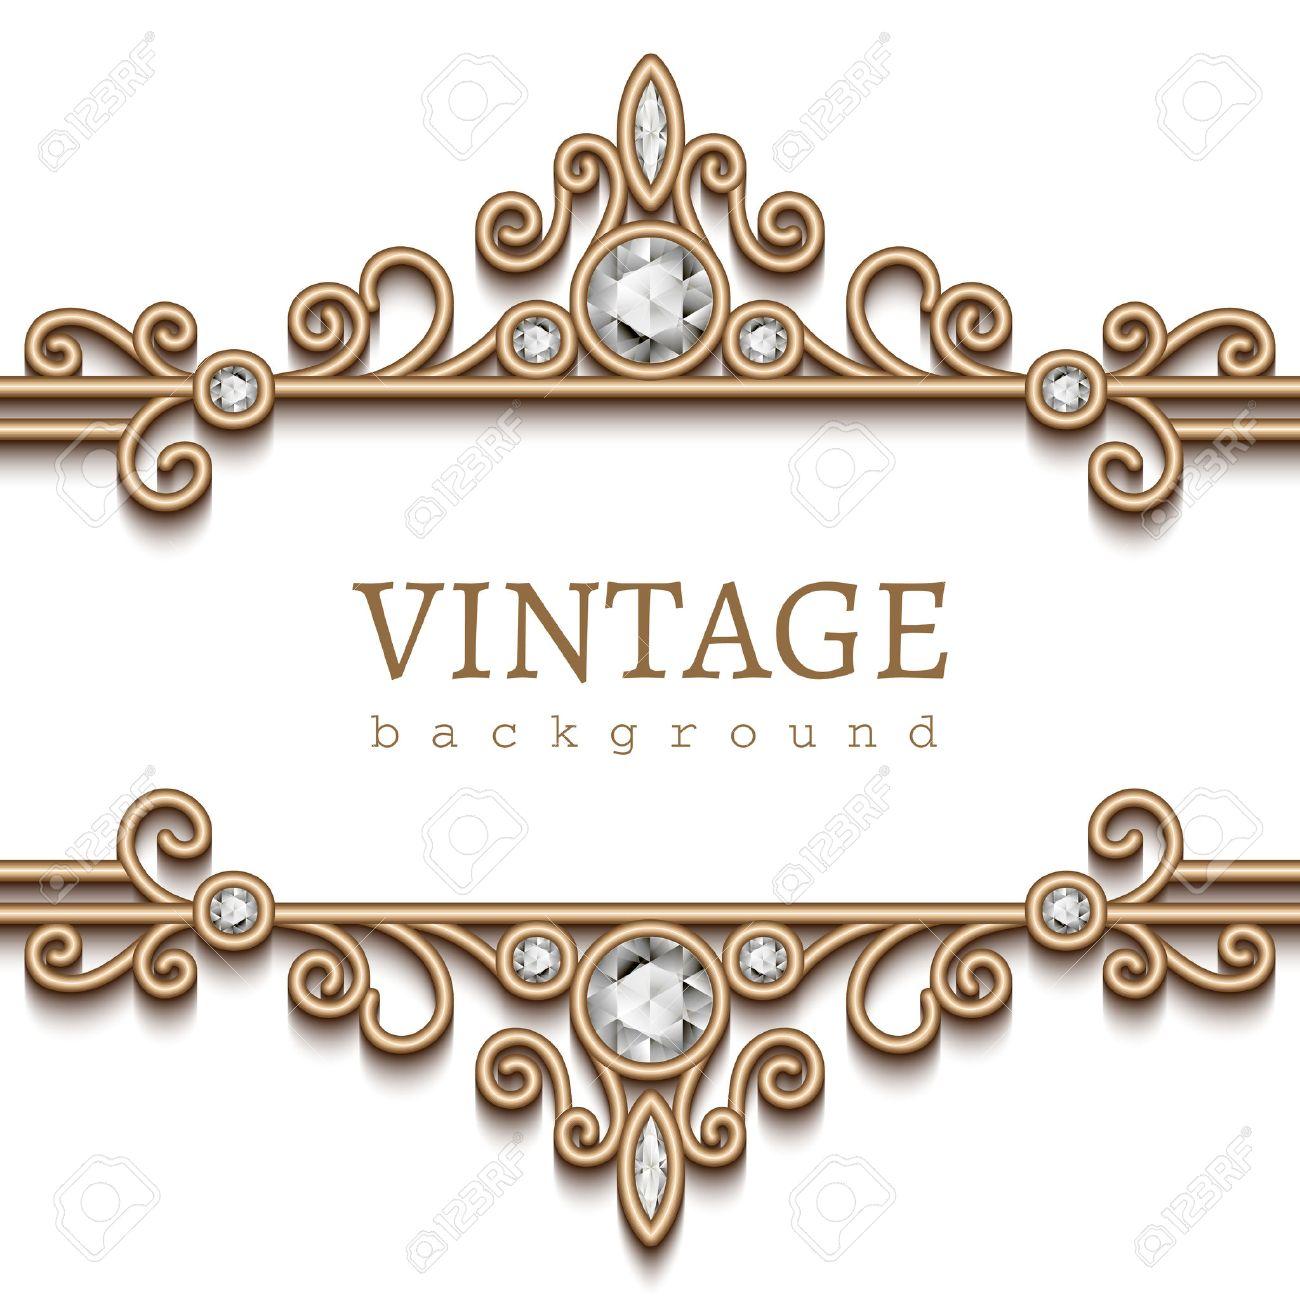 Vintage gold frame on white, divider, header, decorative jewelry background - 43128213